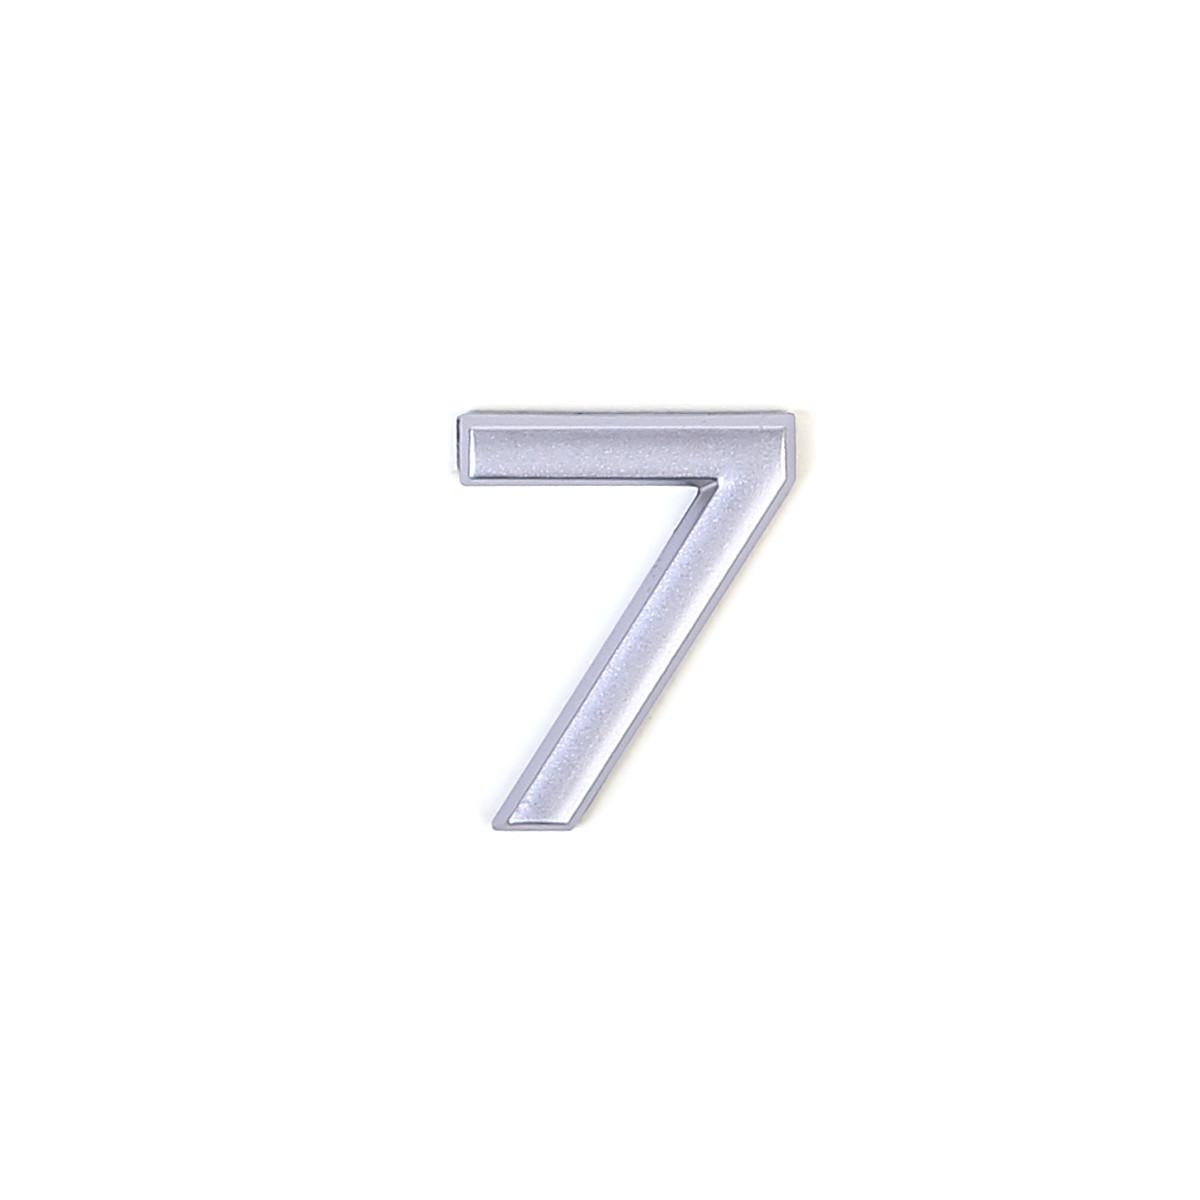 Номер на дверь Larvij цифра 7 матовое серебро. Номер из пластика (LNP4MS#7)